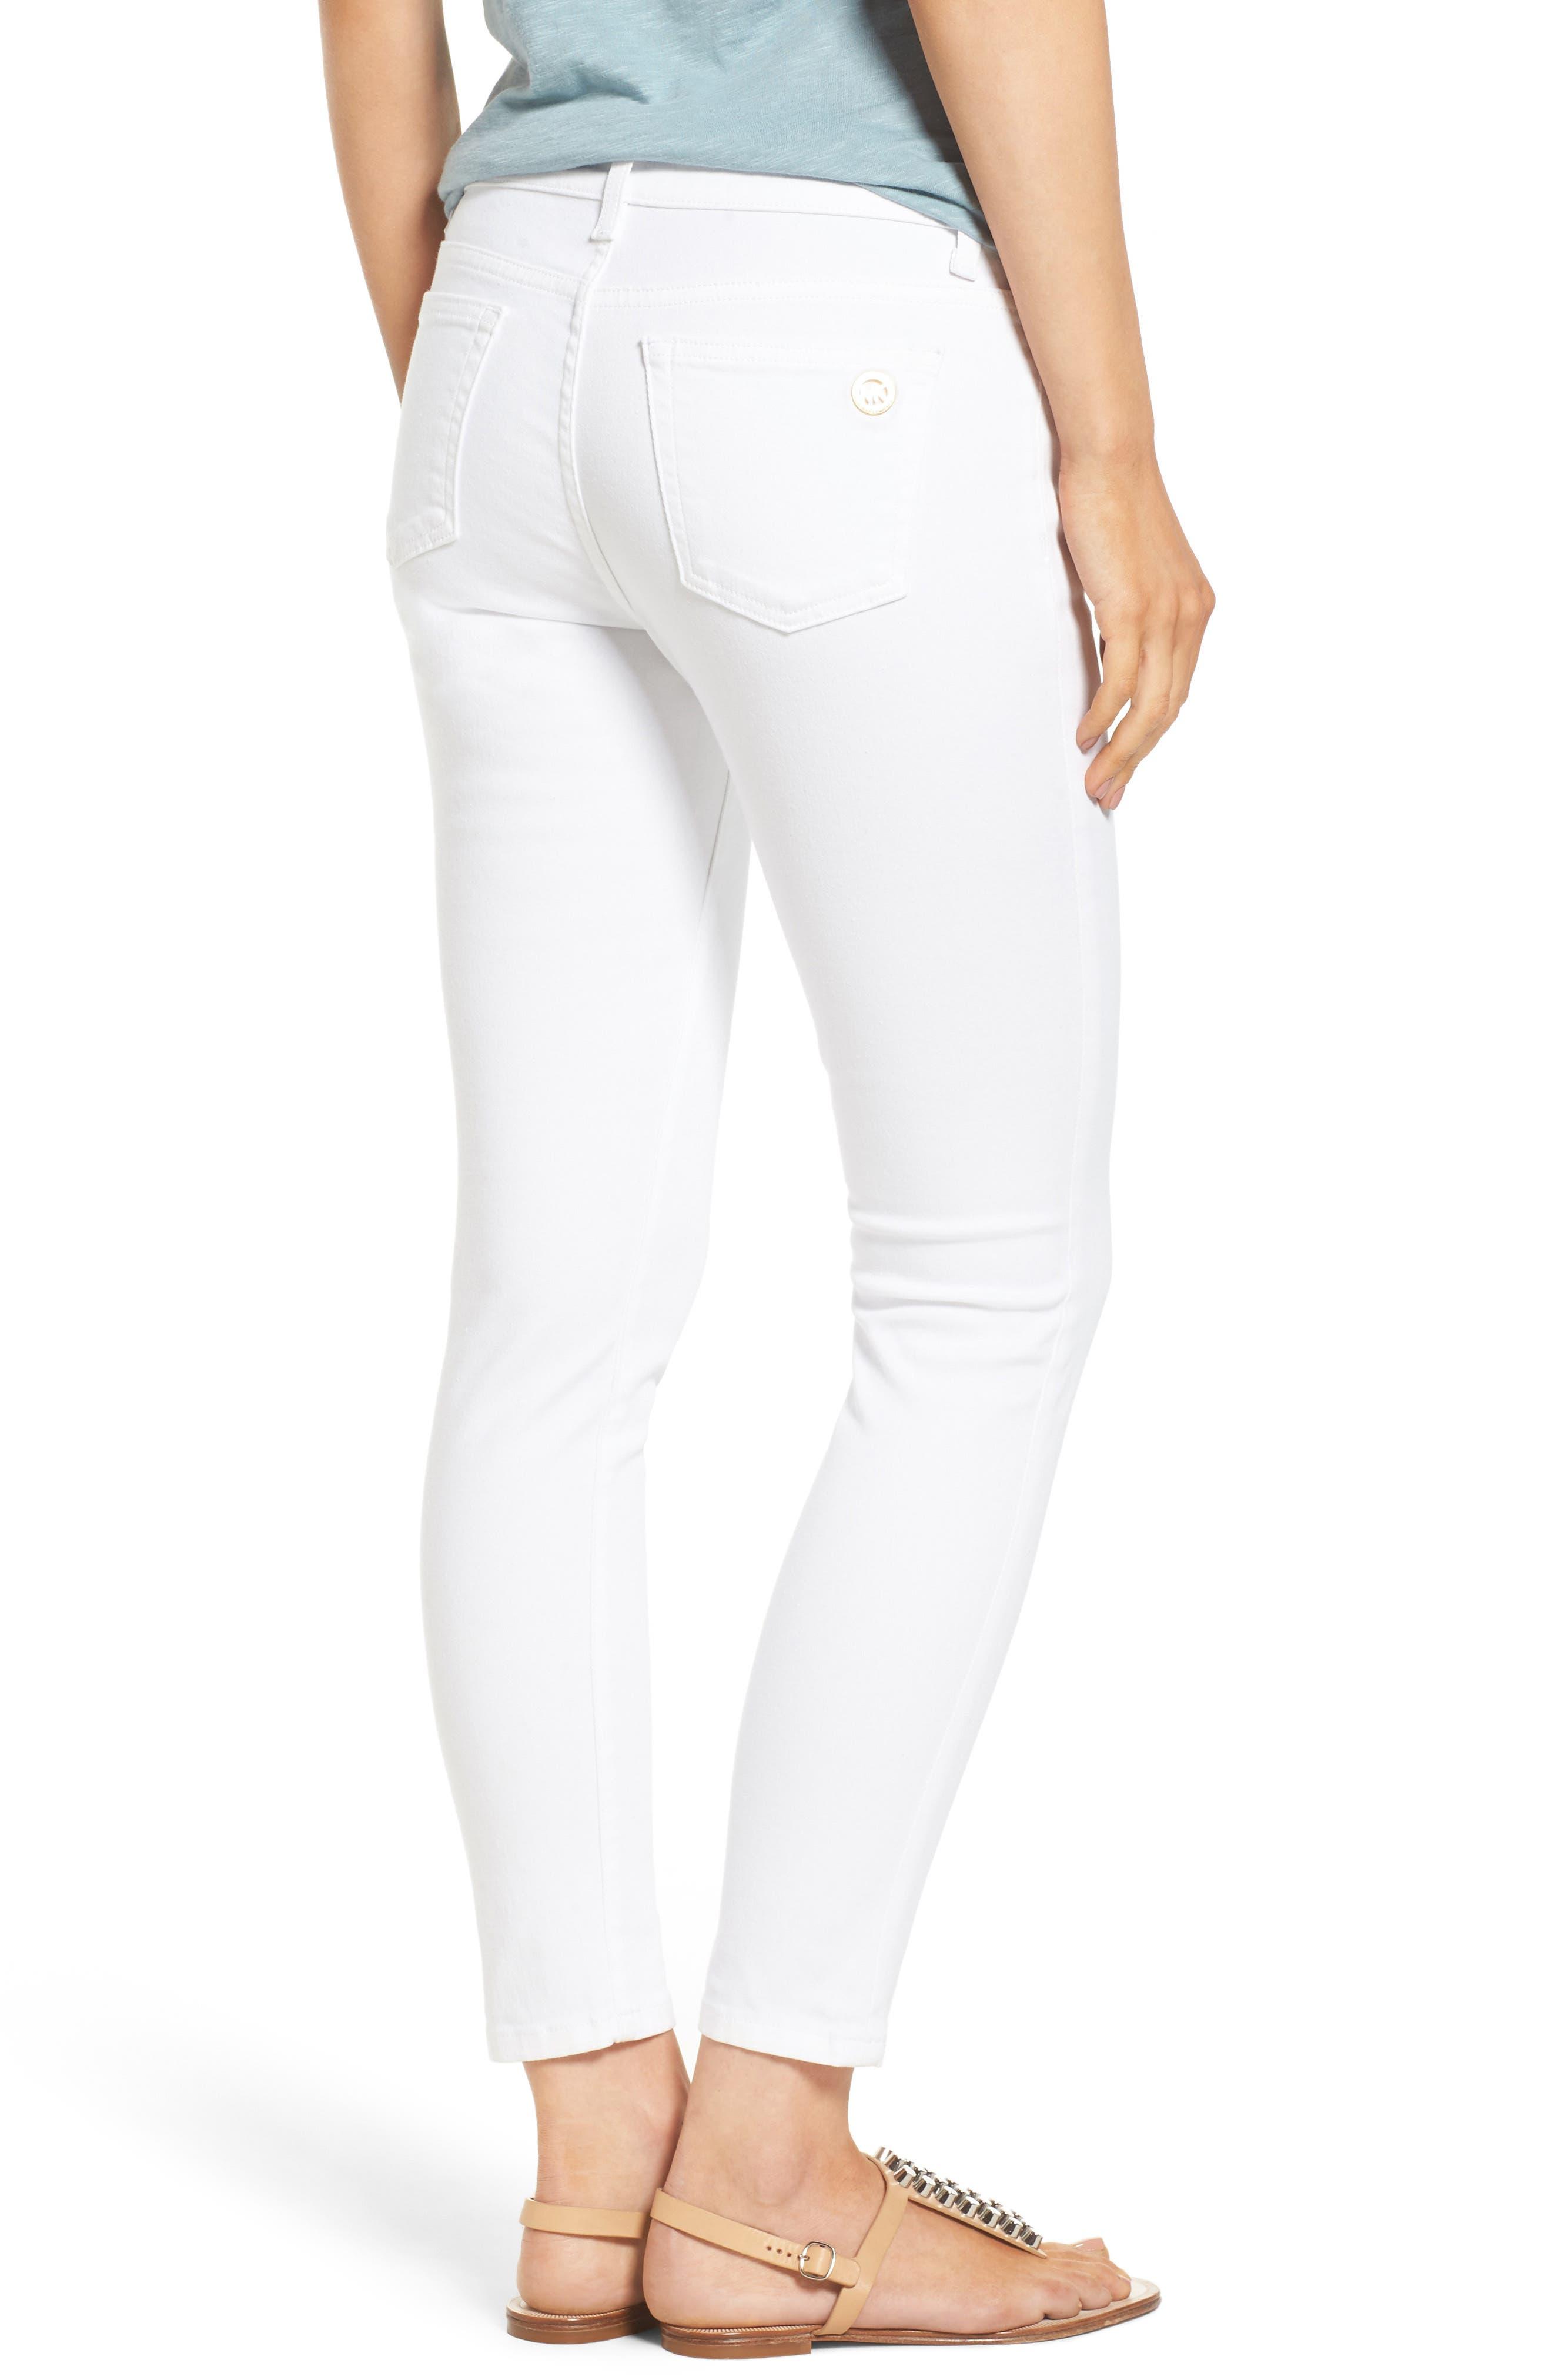 Izzy Ankle Skinny Jeans,                             Alternate thumbnail 2, color,